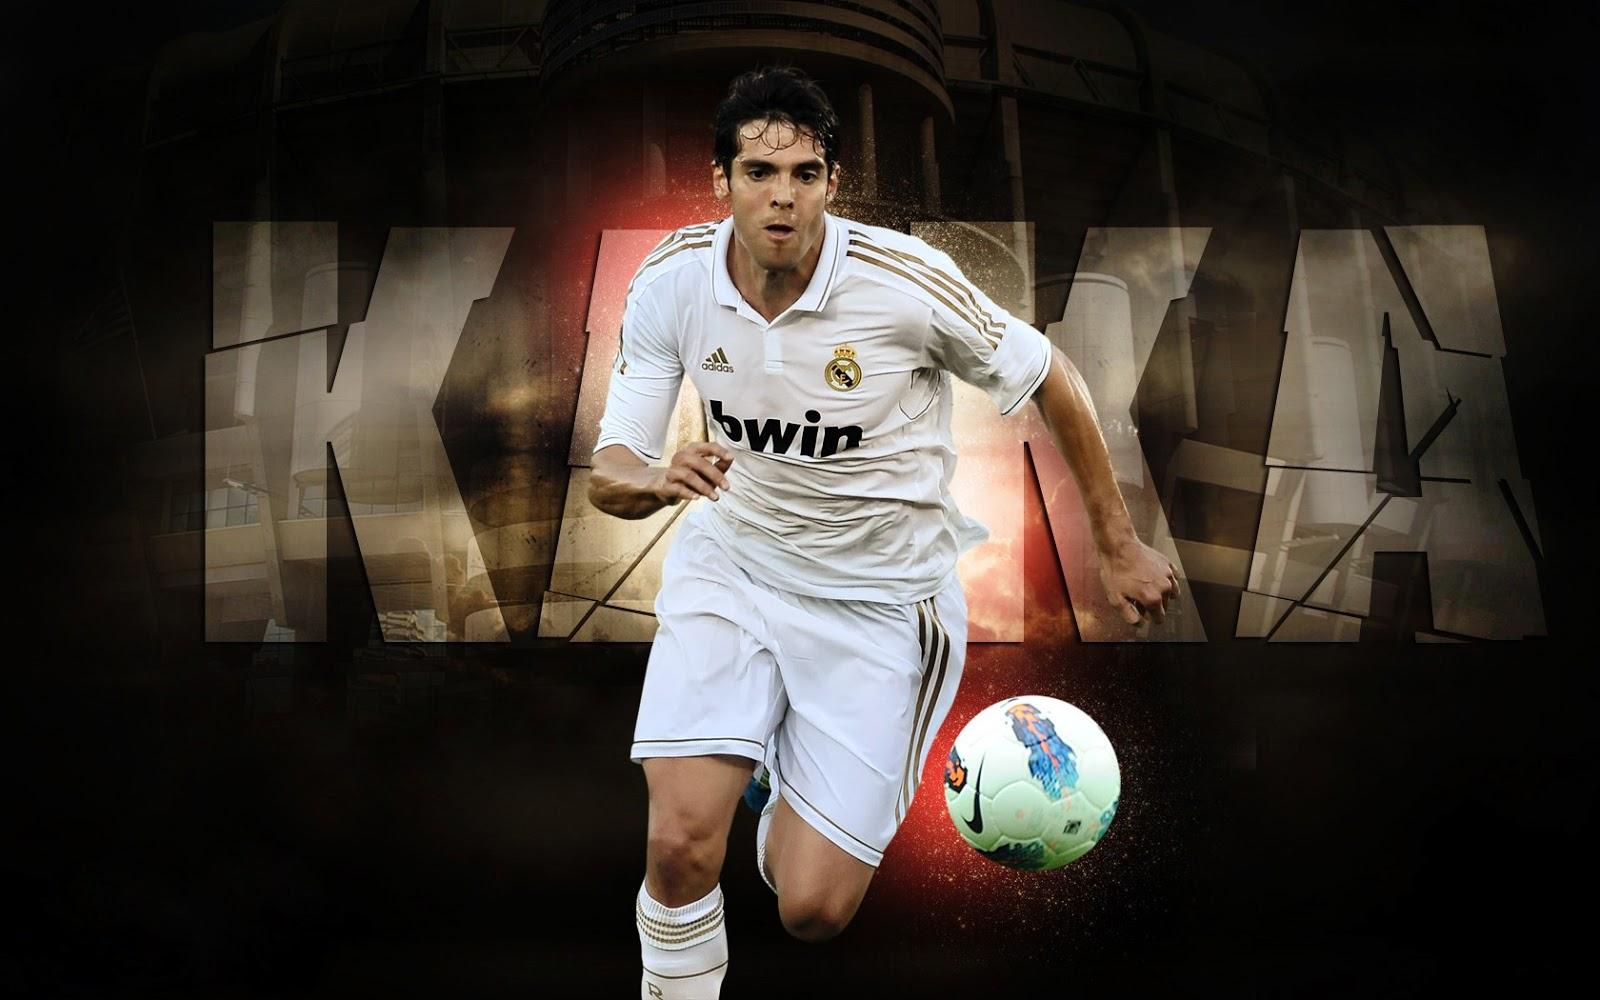 Kaka Real Madrid Latest HD Wallpaper 2013 Latest Hd Wallpapers 1600x1000